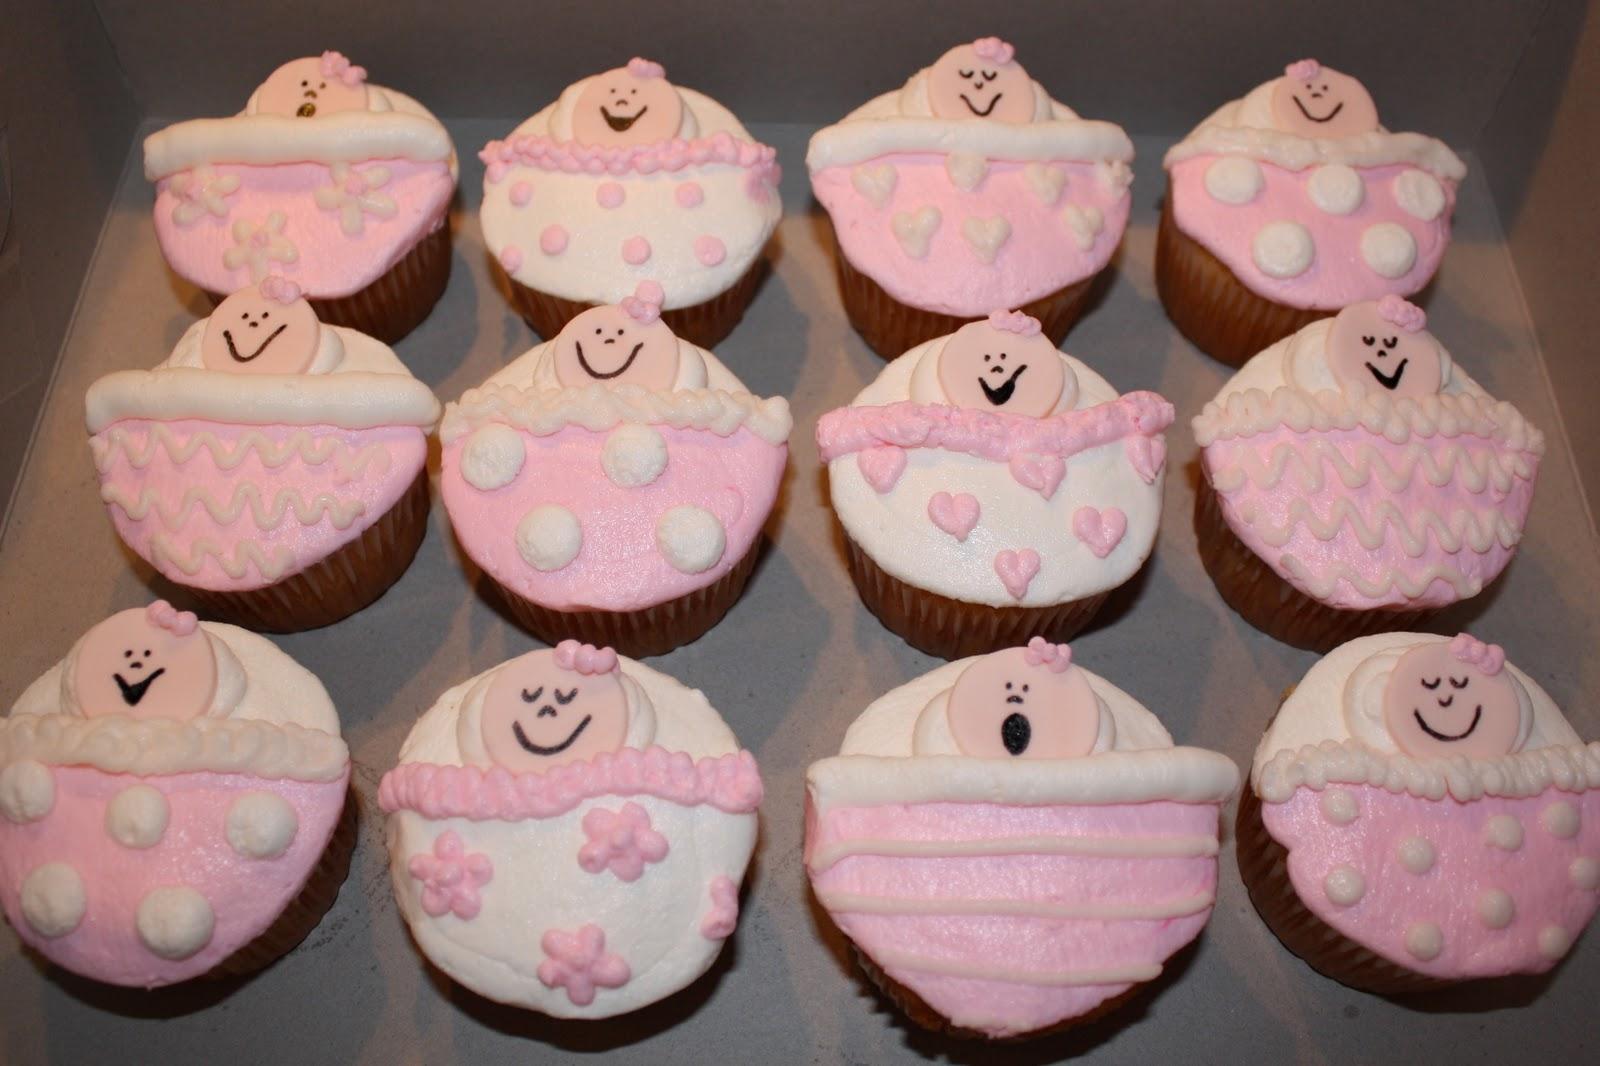 Girl Baby Shower Cupcakes Images ~ Kake baby girl shower cupcakes